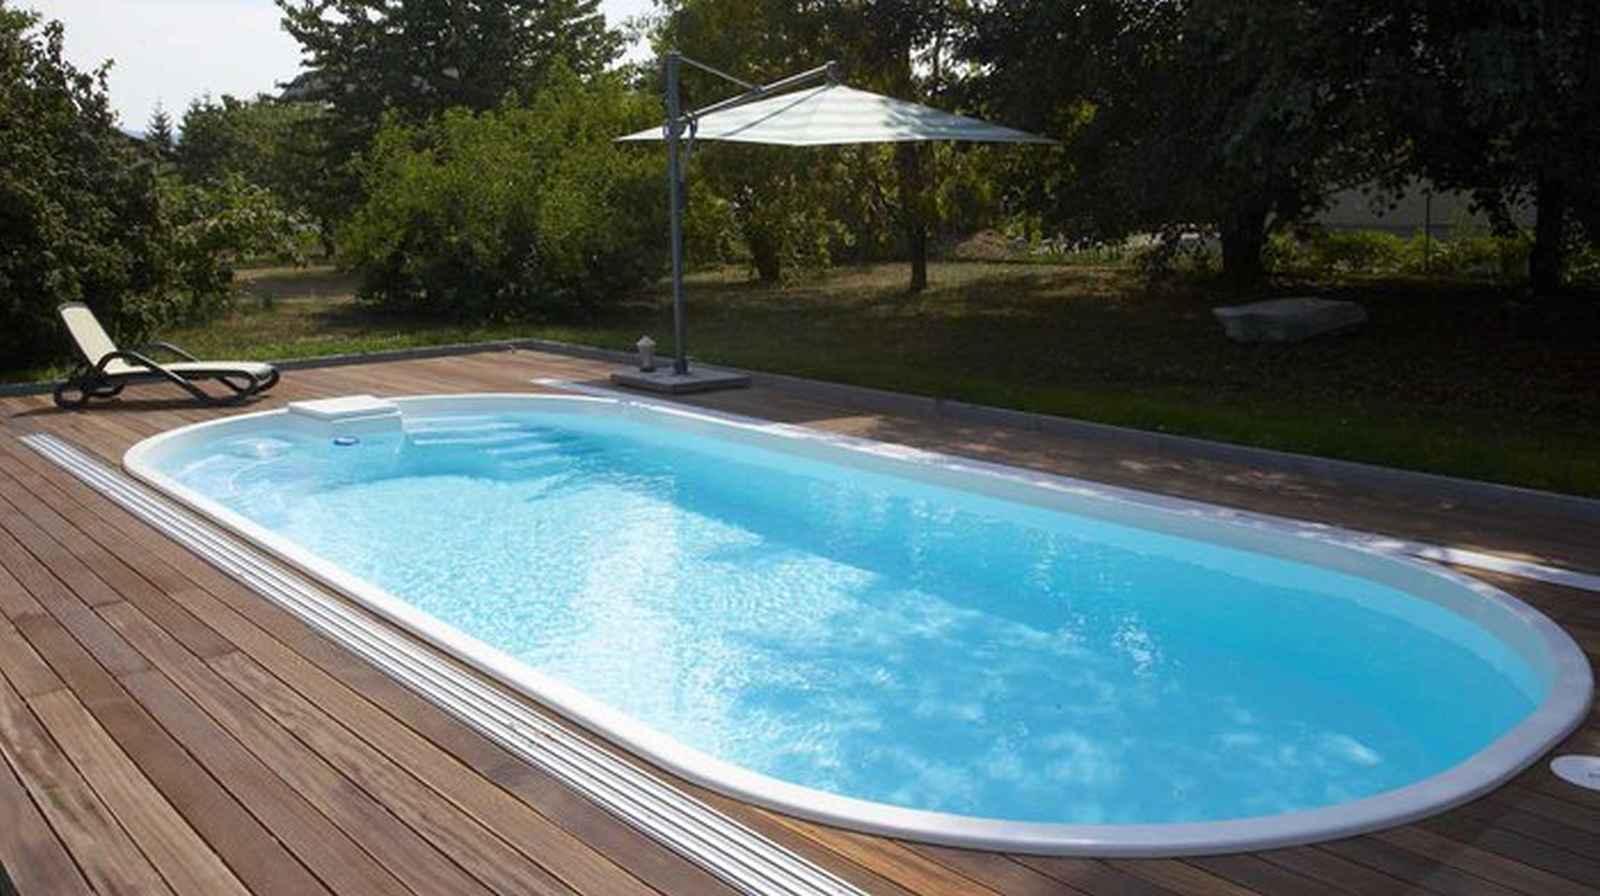 Modell adria 85 schwimmbadtechnik frankfurt - Pool mit stahlrahmen ...